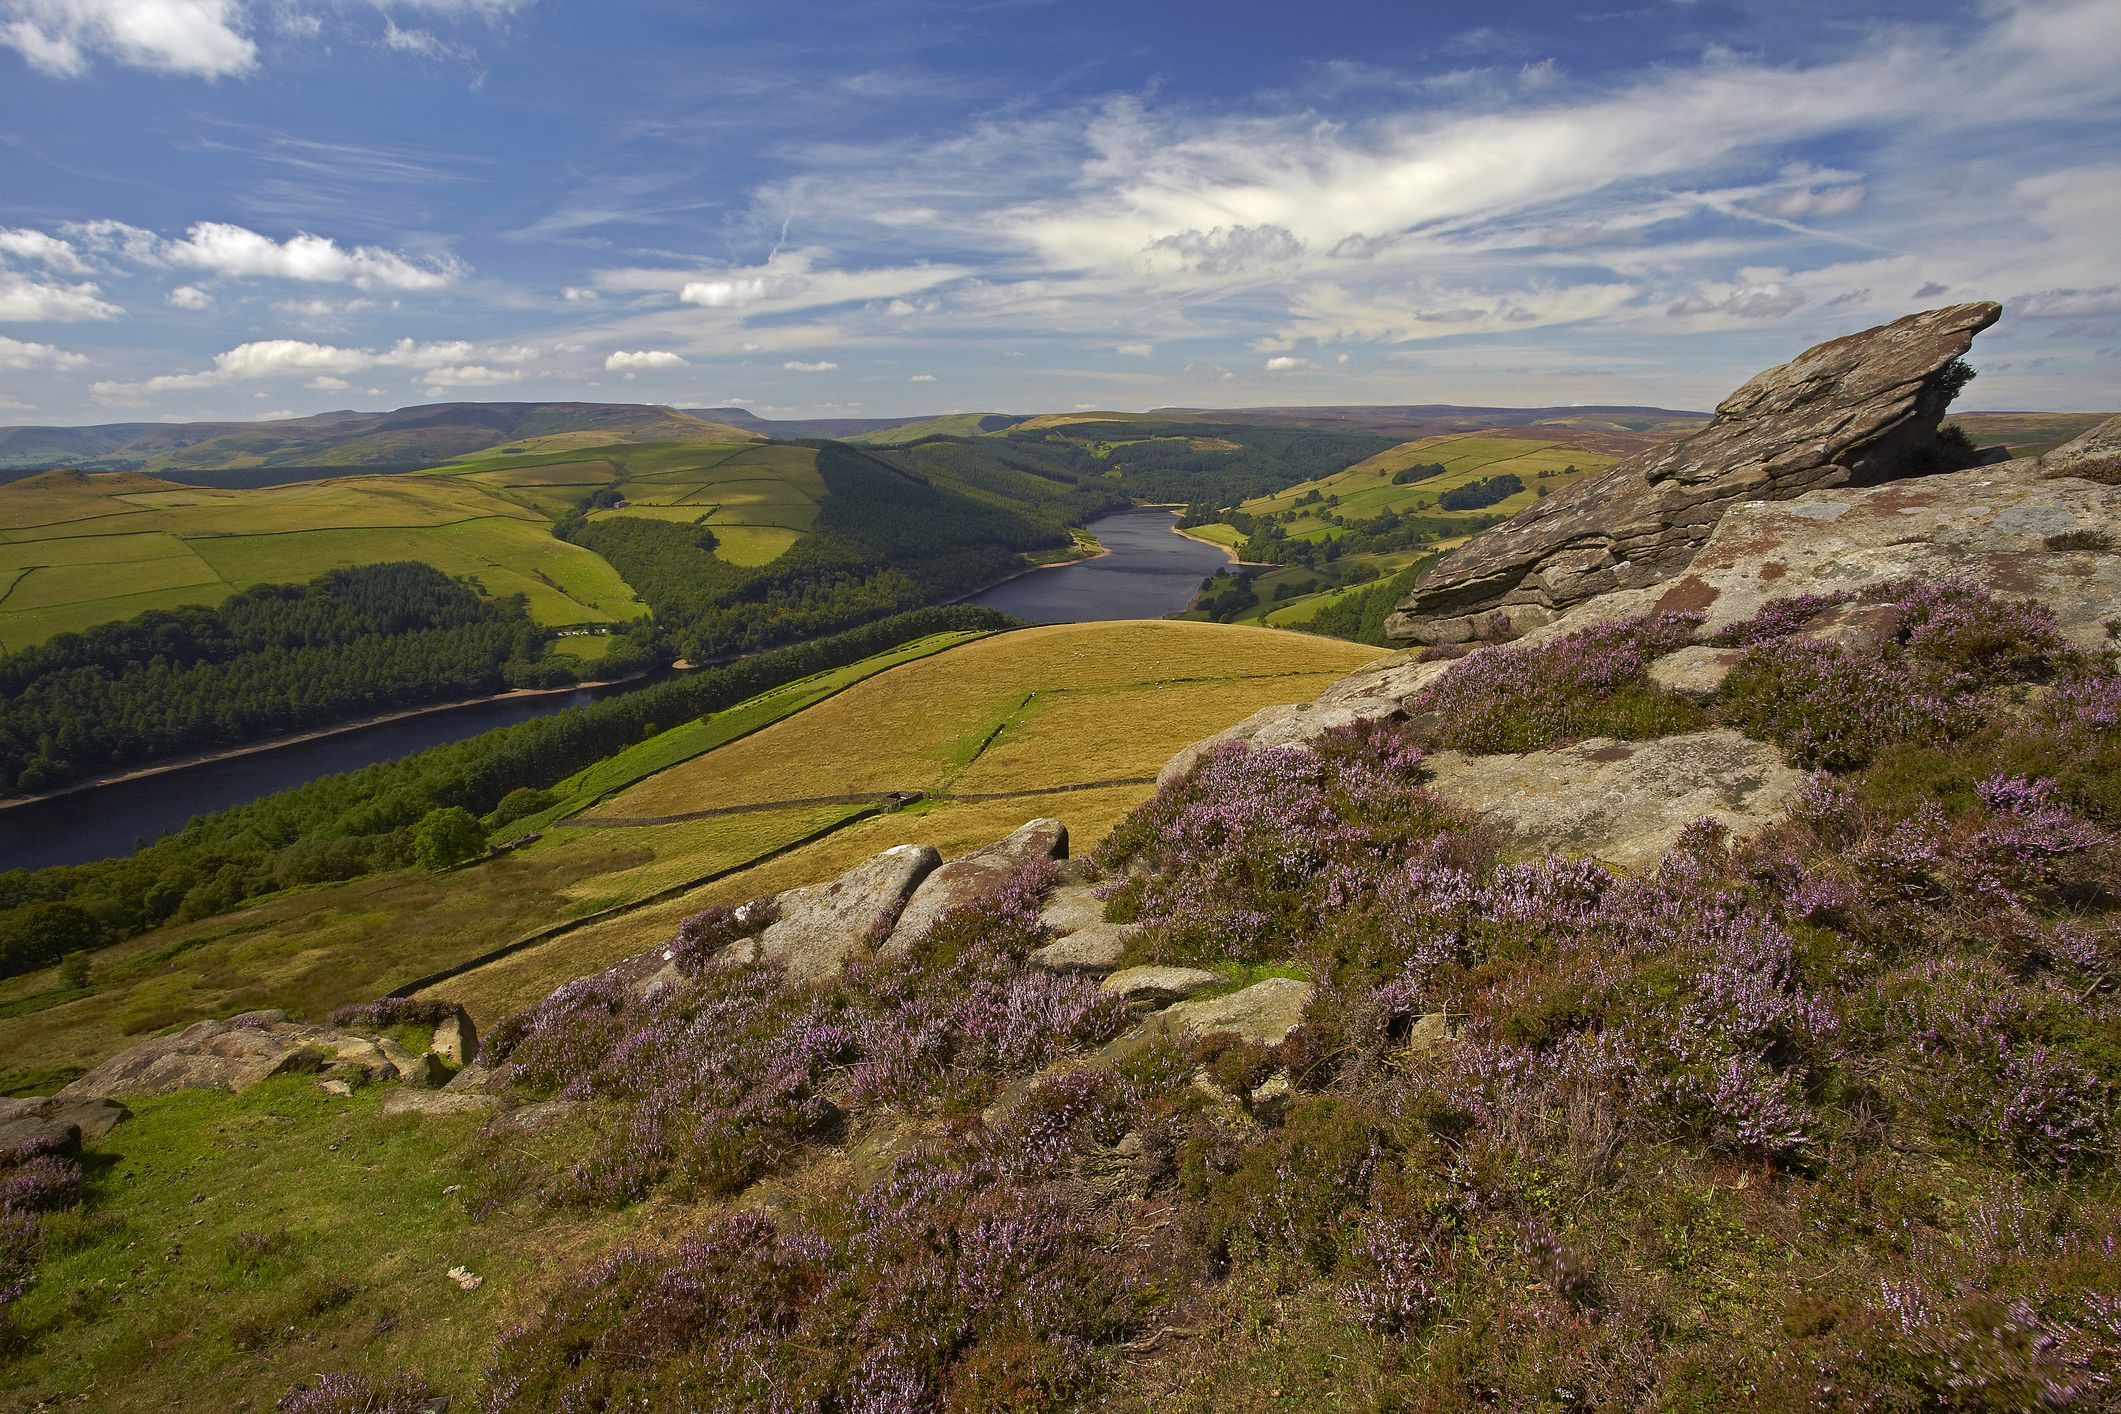 A view towards Ladybower Reservoir in the Upper Derwent Valley from Derwent Edge in the Peak District National Park.